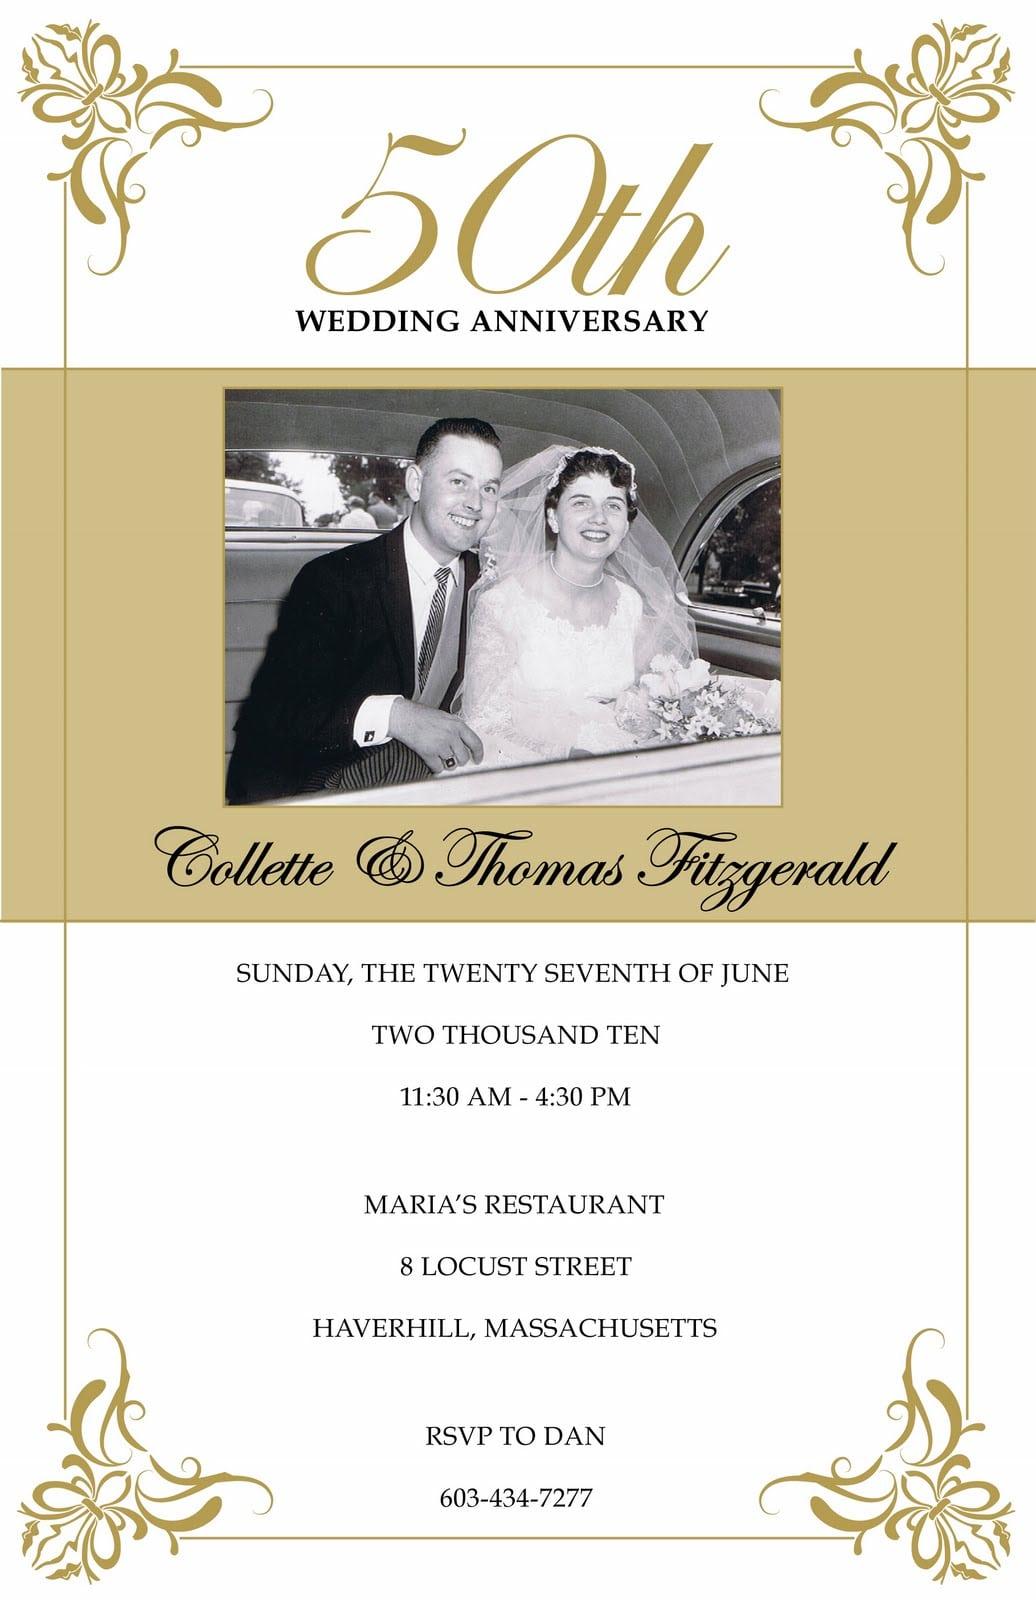 Sample Invitation For Wedding Anniversary